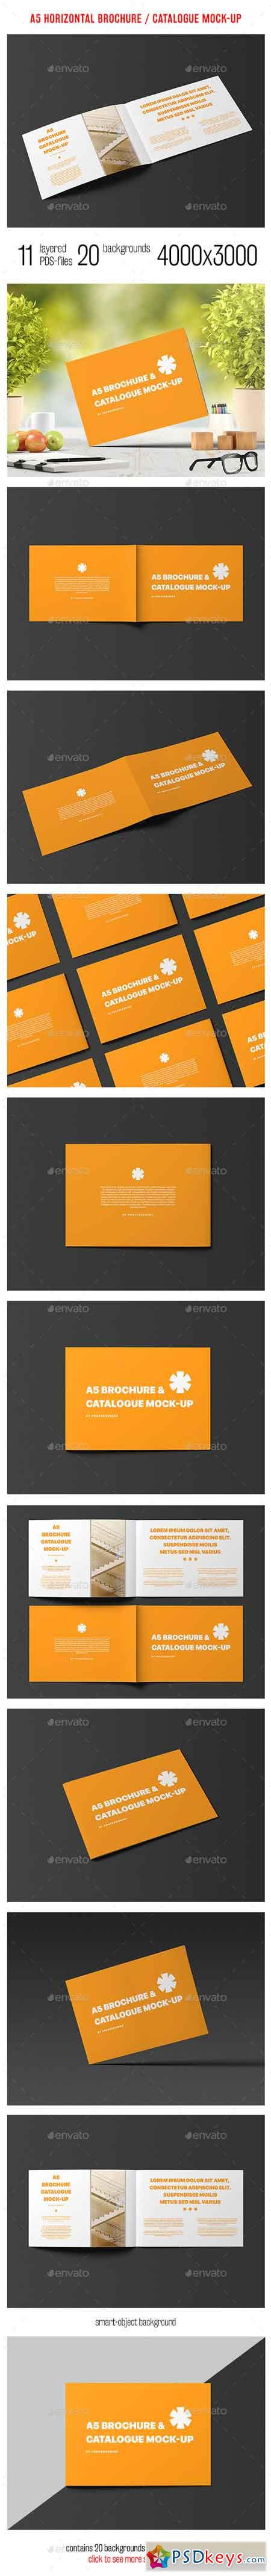 A5 Horizontal Catalogue Brochure Mock-Up 14425923